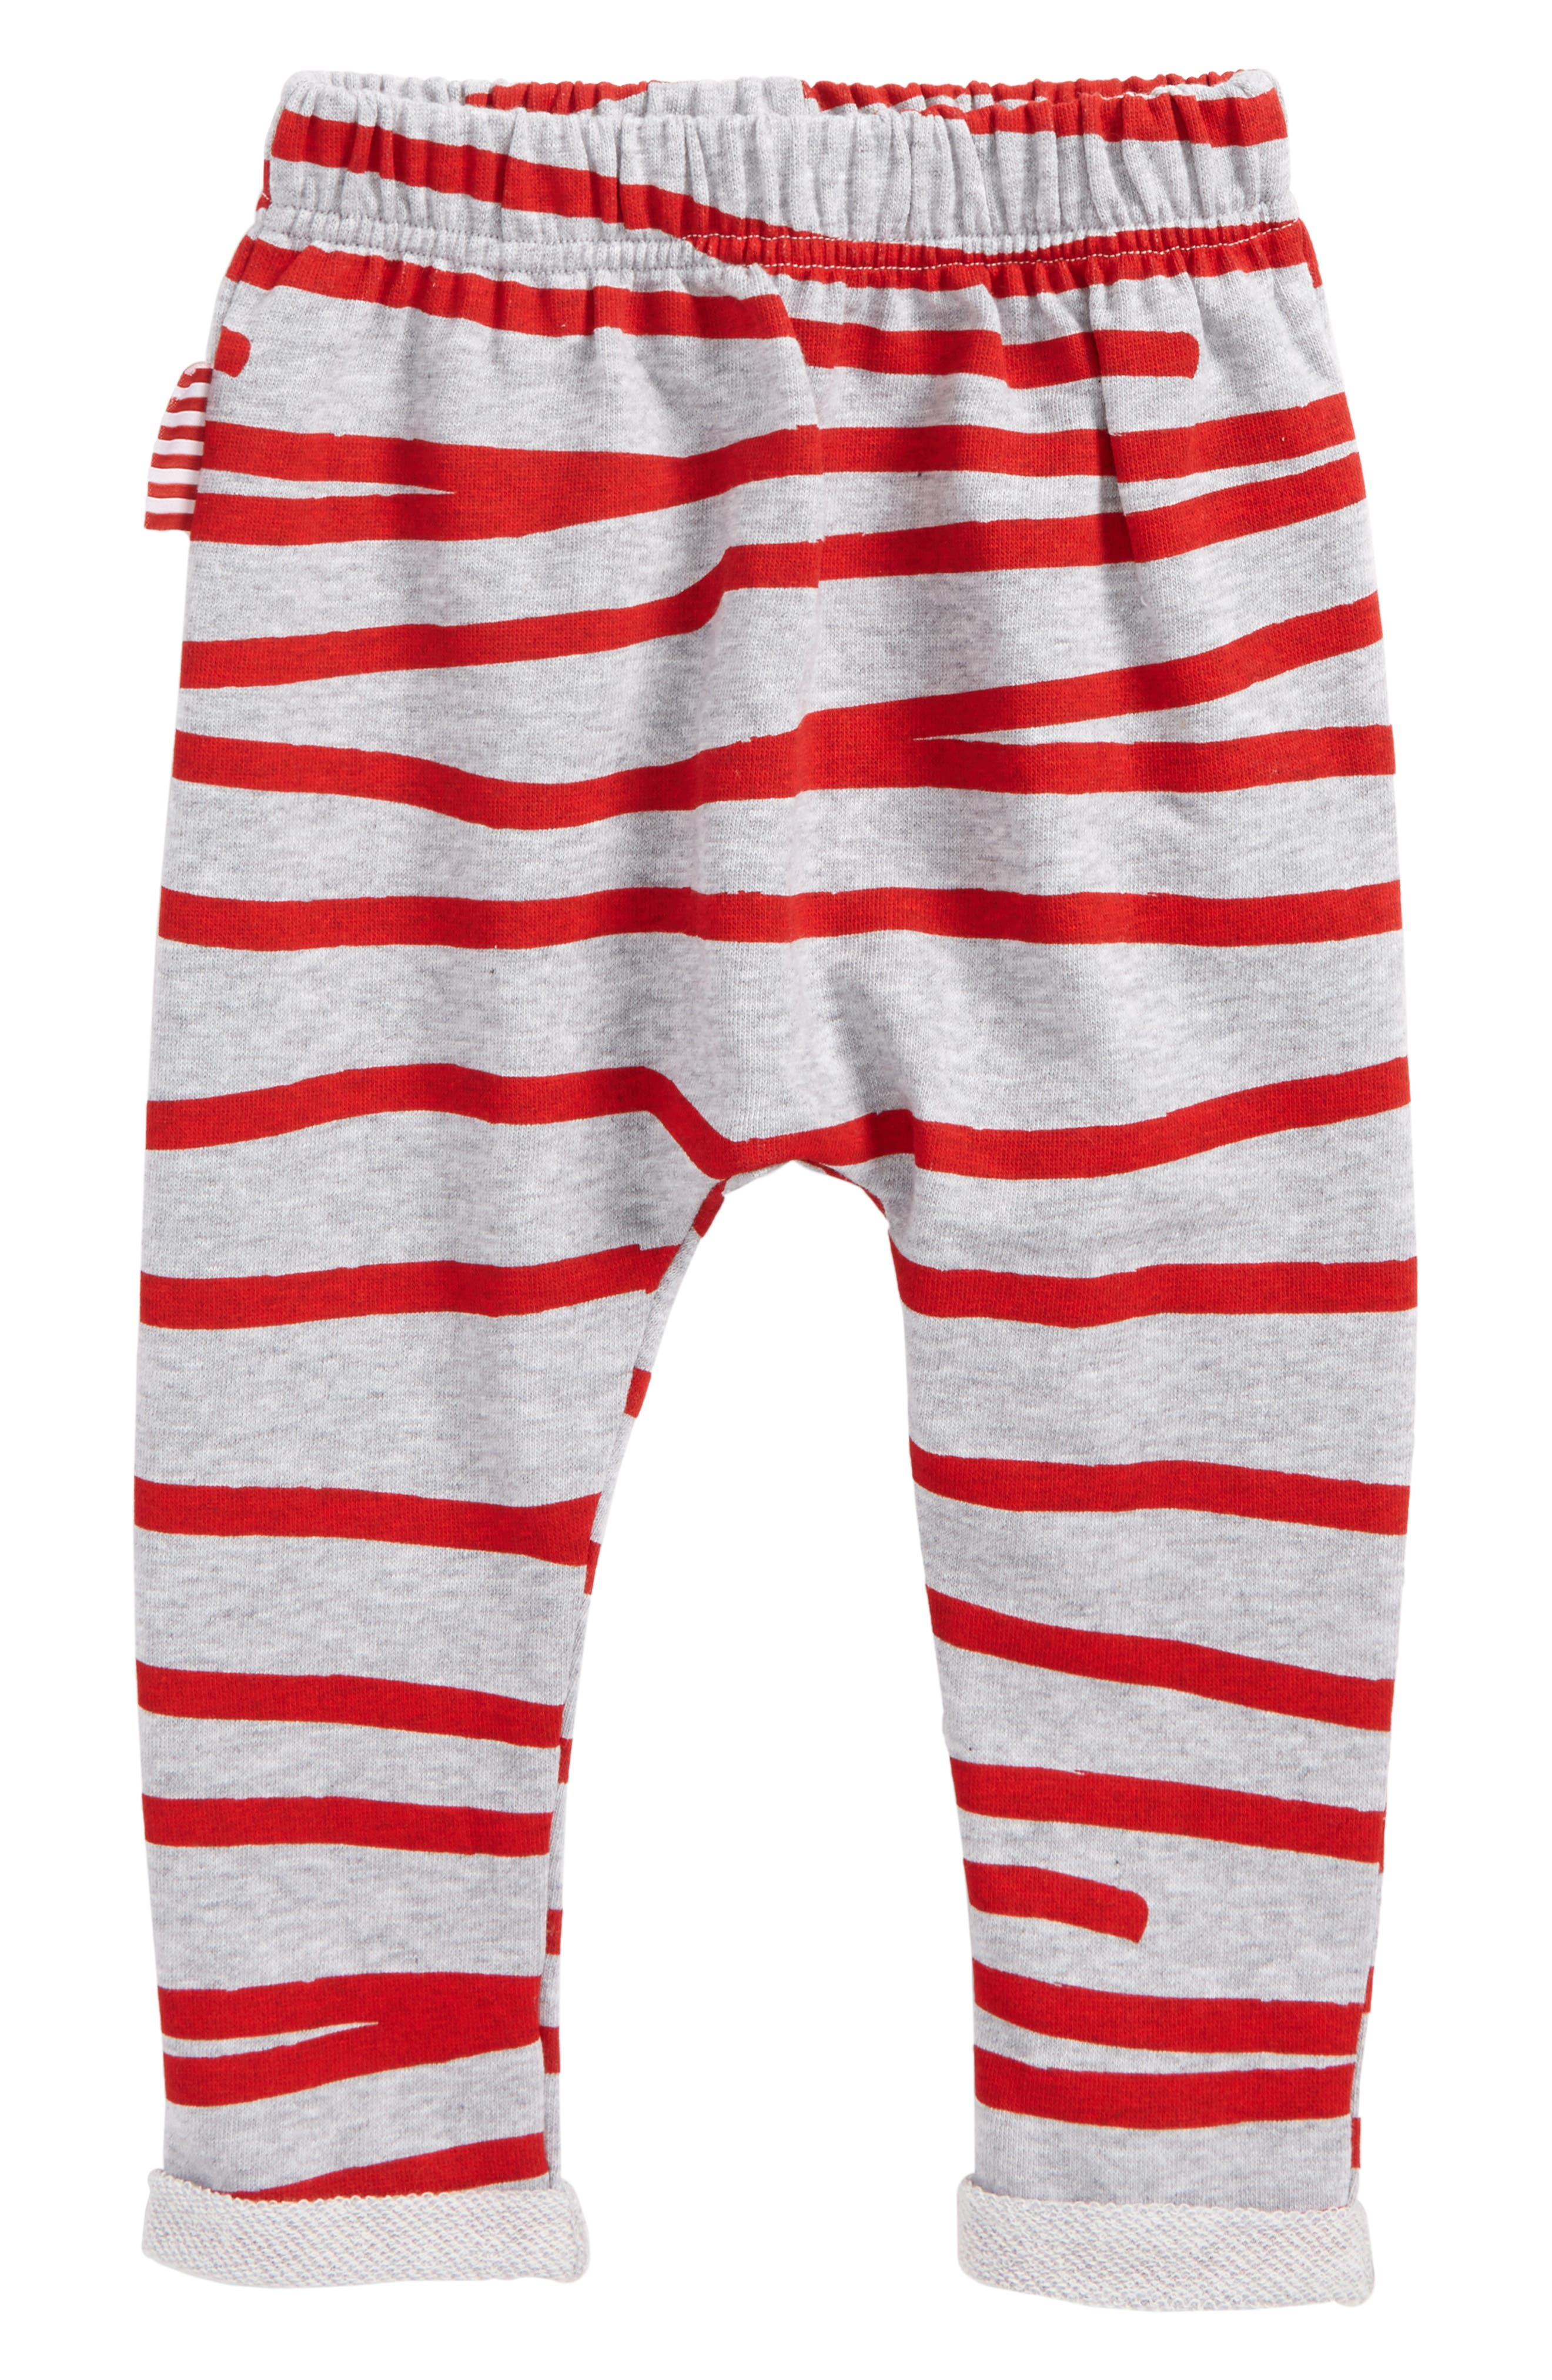 SOOKIbaby Stripe Jogger Pants (Baby)